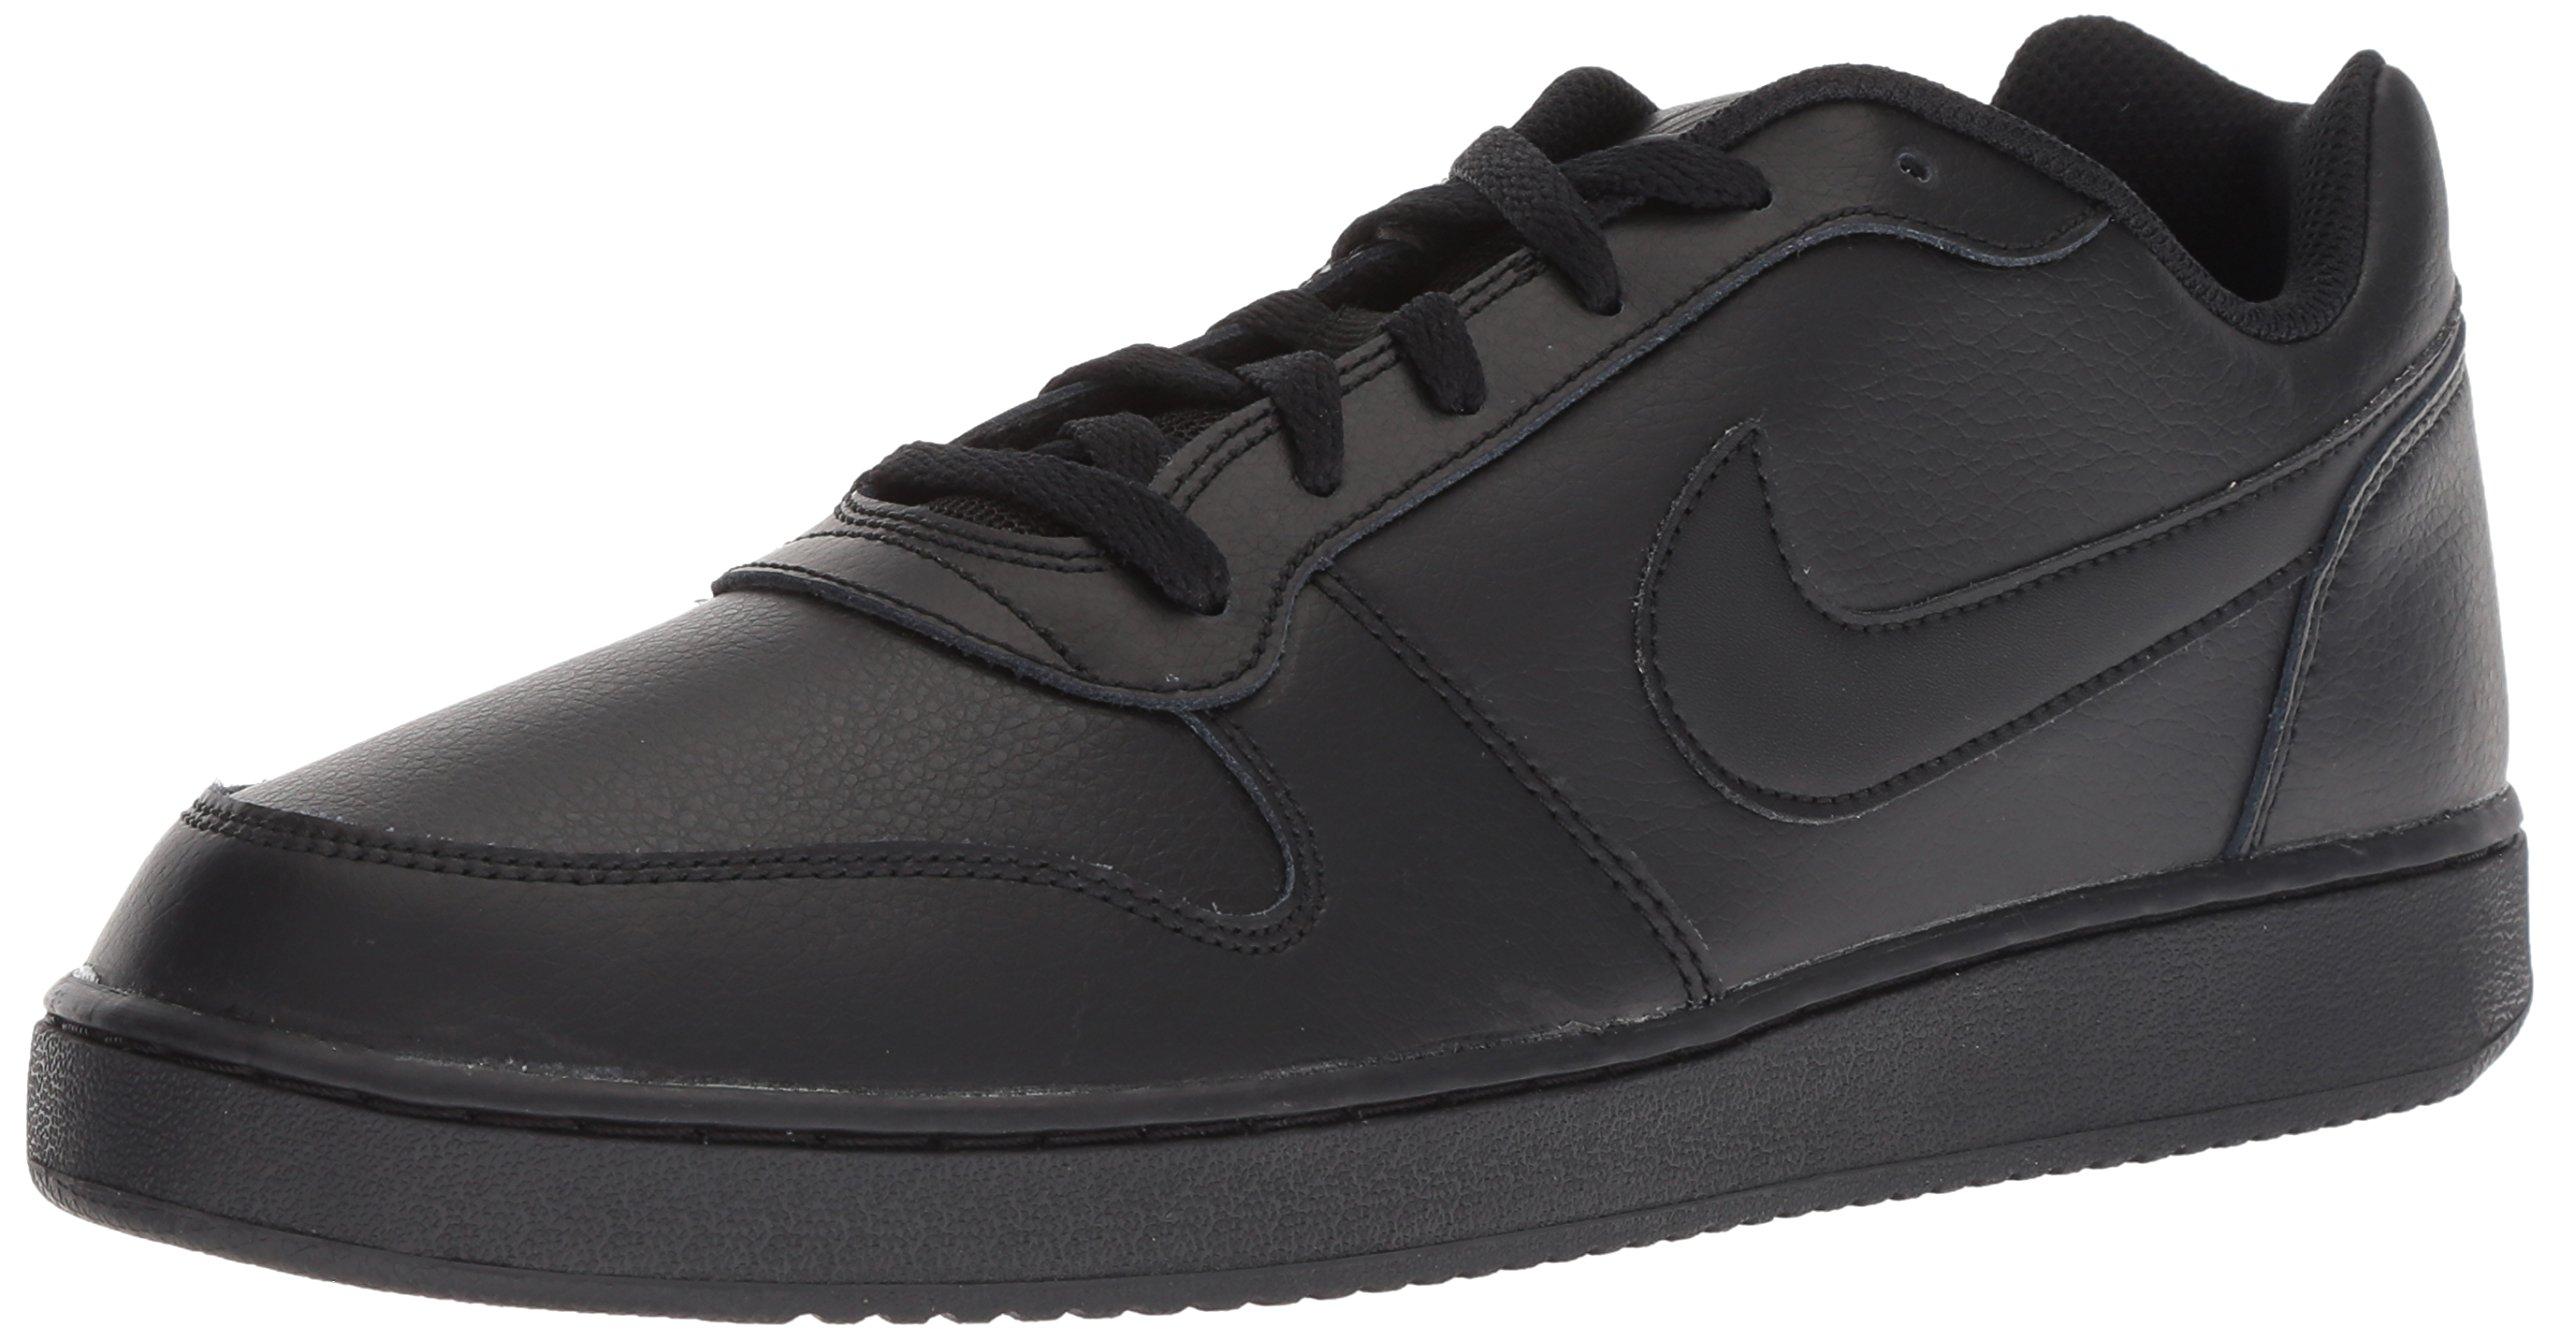 hot sale online 6ba16 ce8df Galleon - NIKE Mens Ebernon Low Basketball Shoe, Black, 7 Re